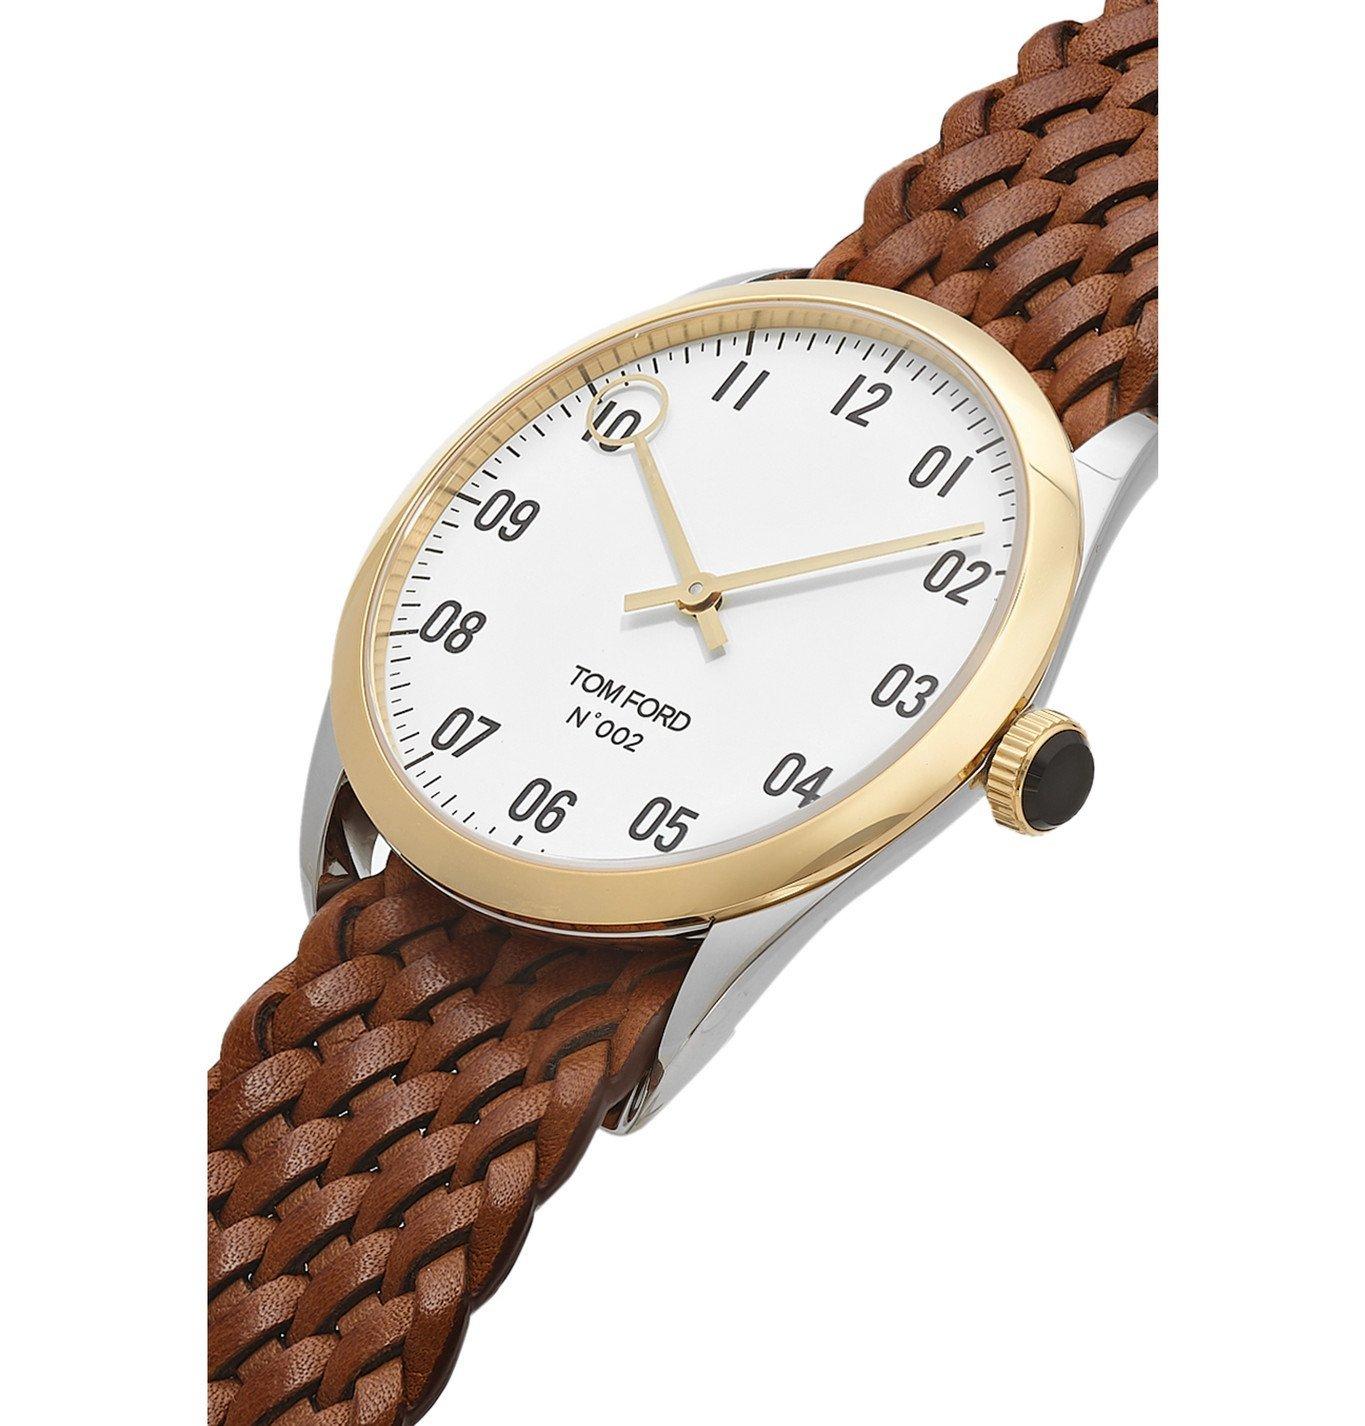 Tom Ford Timepieces - 002 40mm 18-Karat Gold and Alligator Watch - Brown